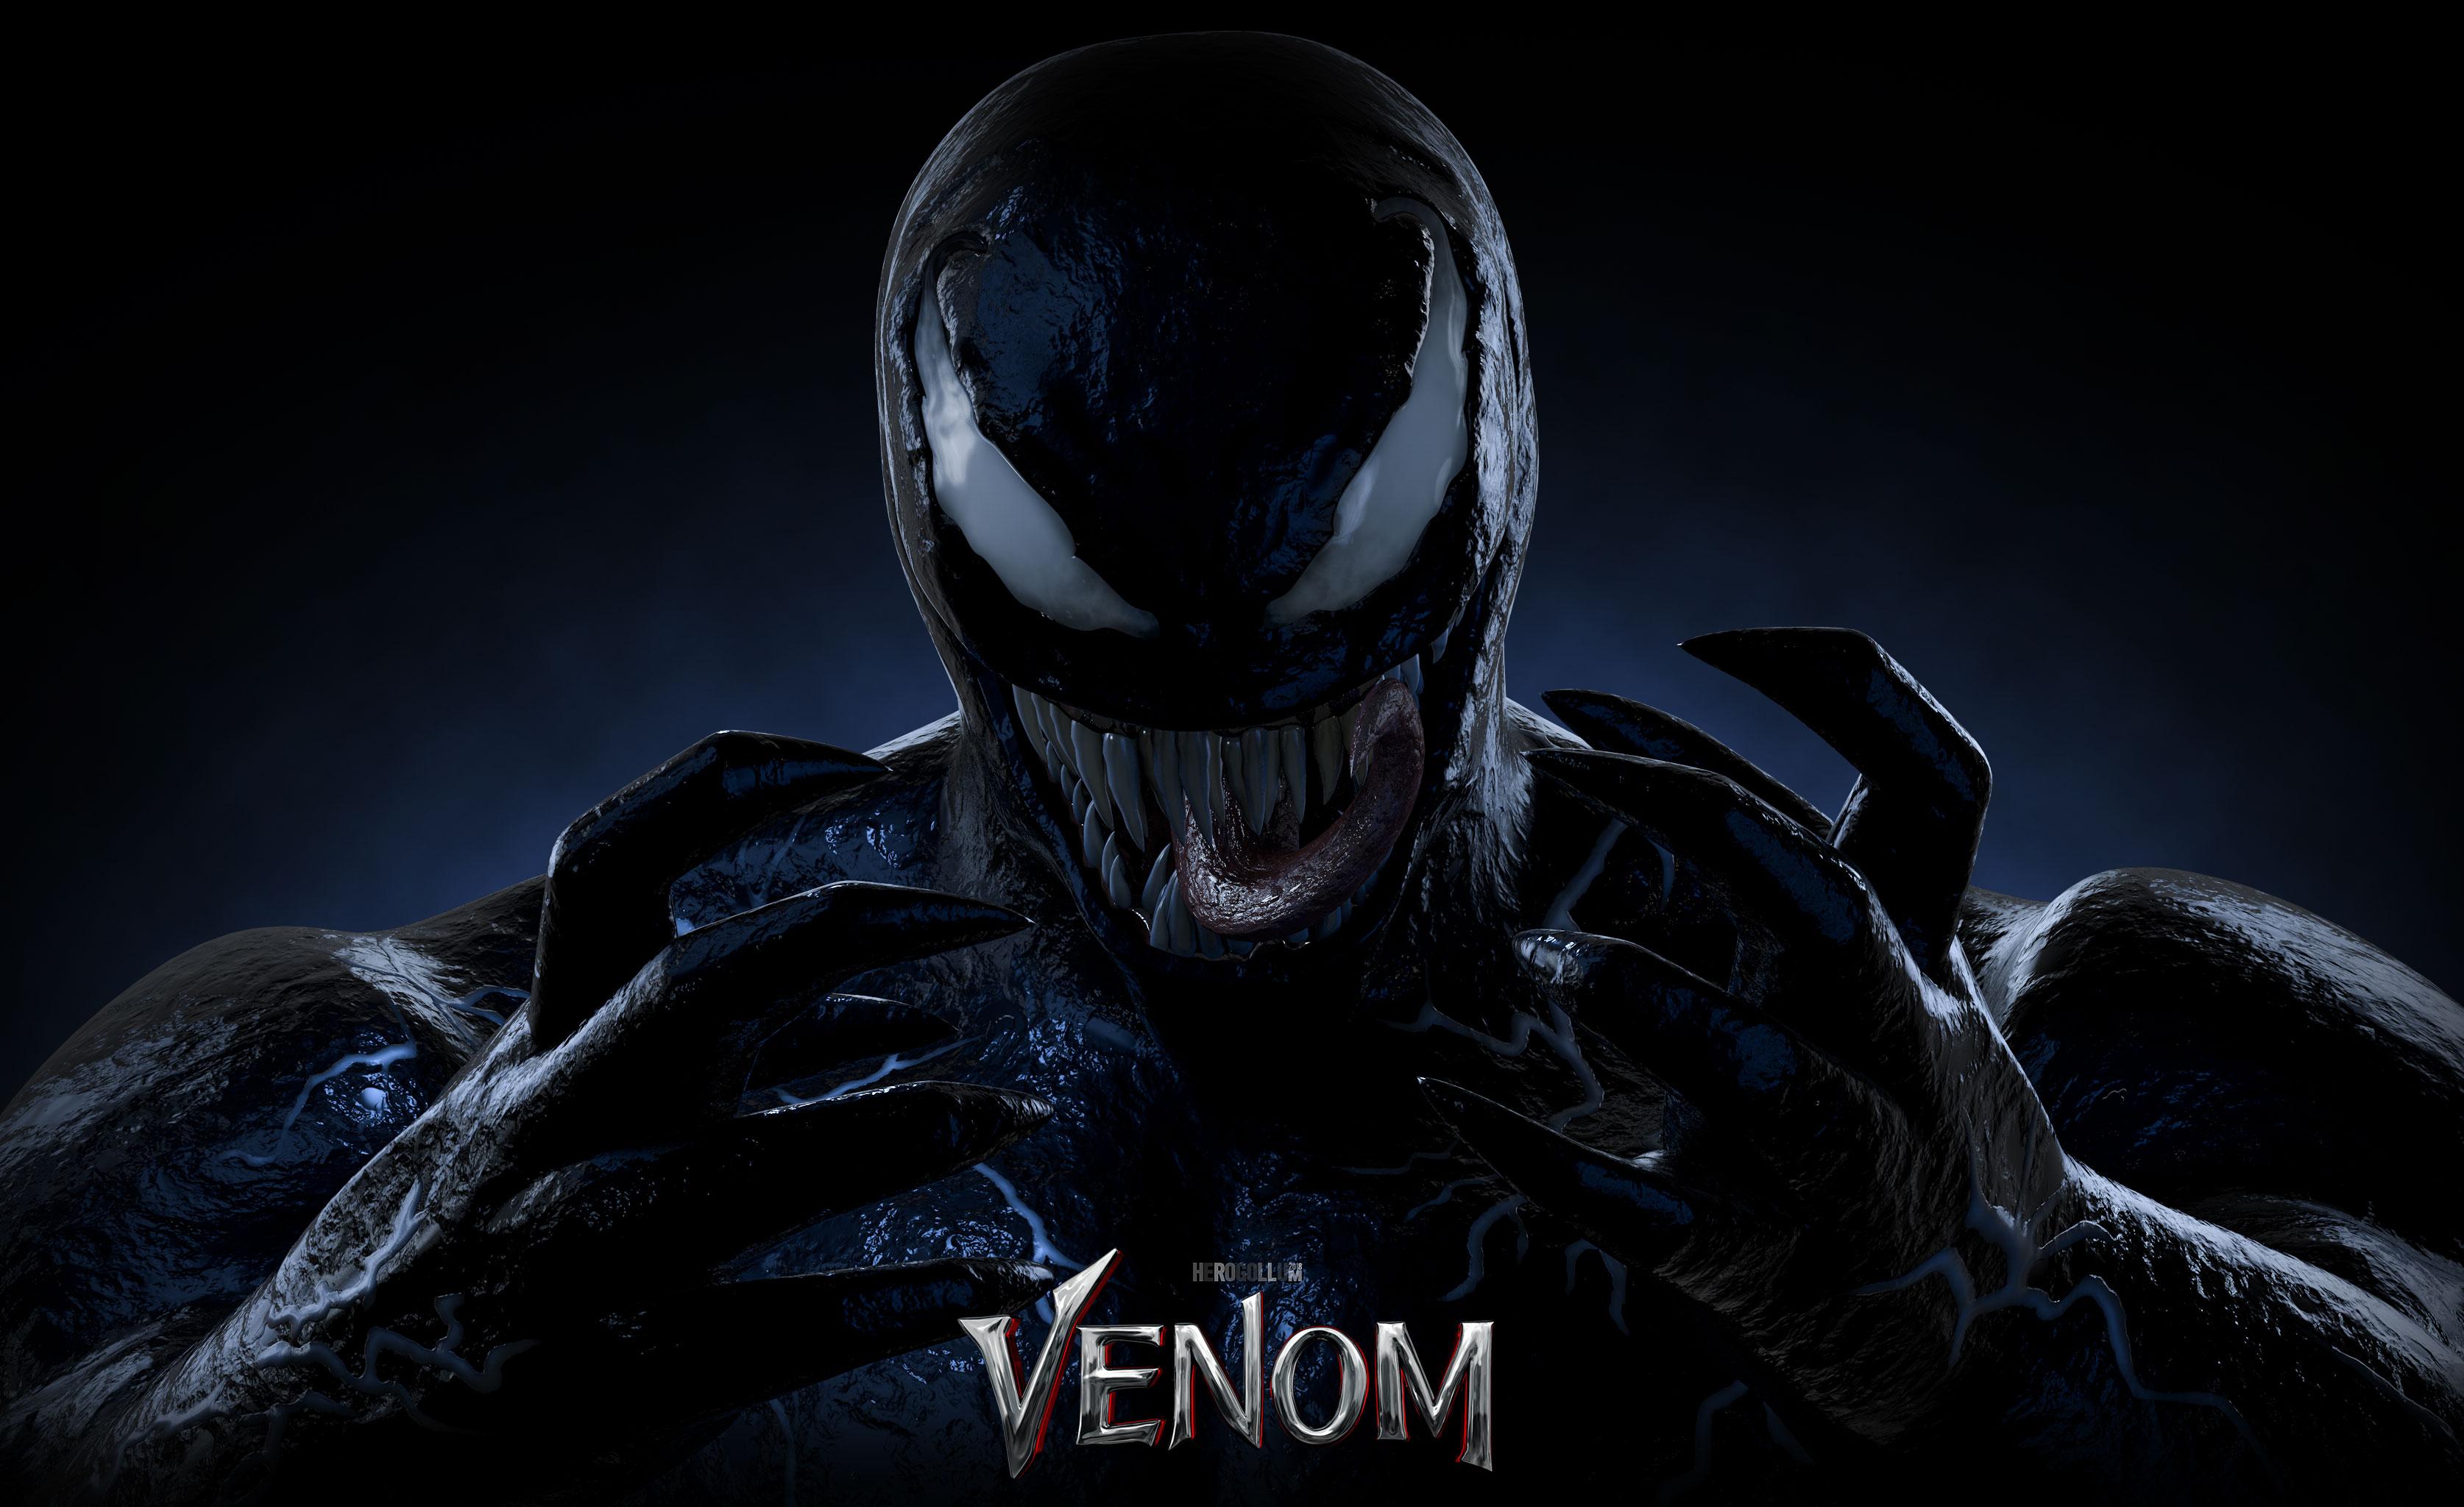 Venom Fond D Ecran Hd Arriere Plan 3348x2048 Id 945699